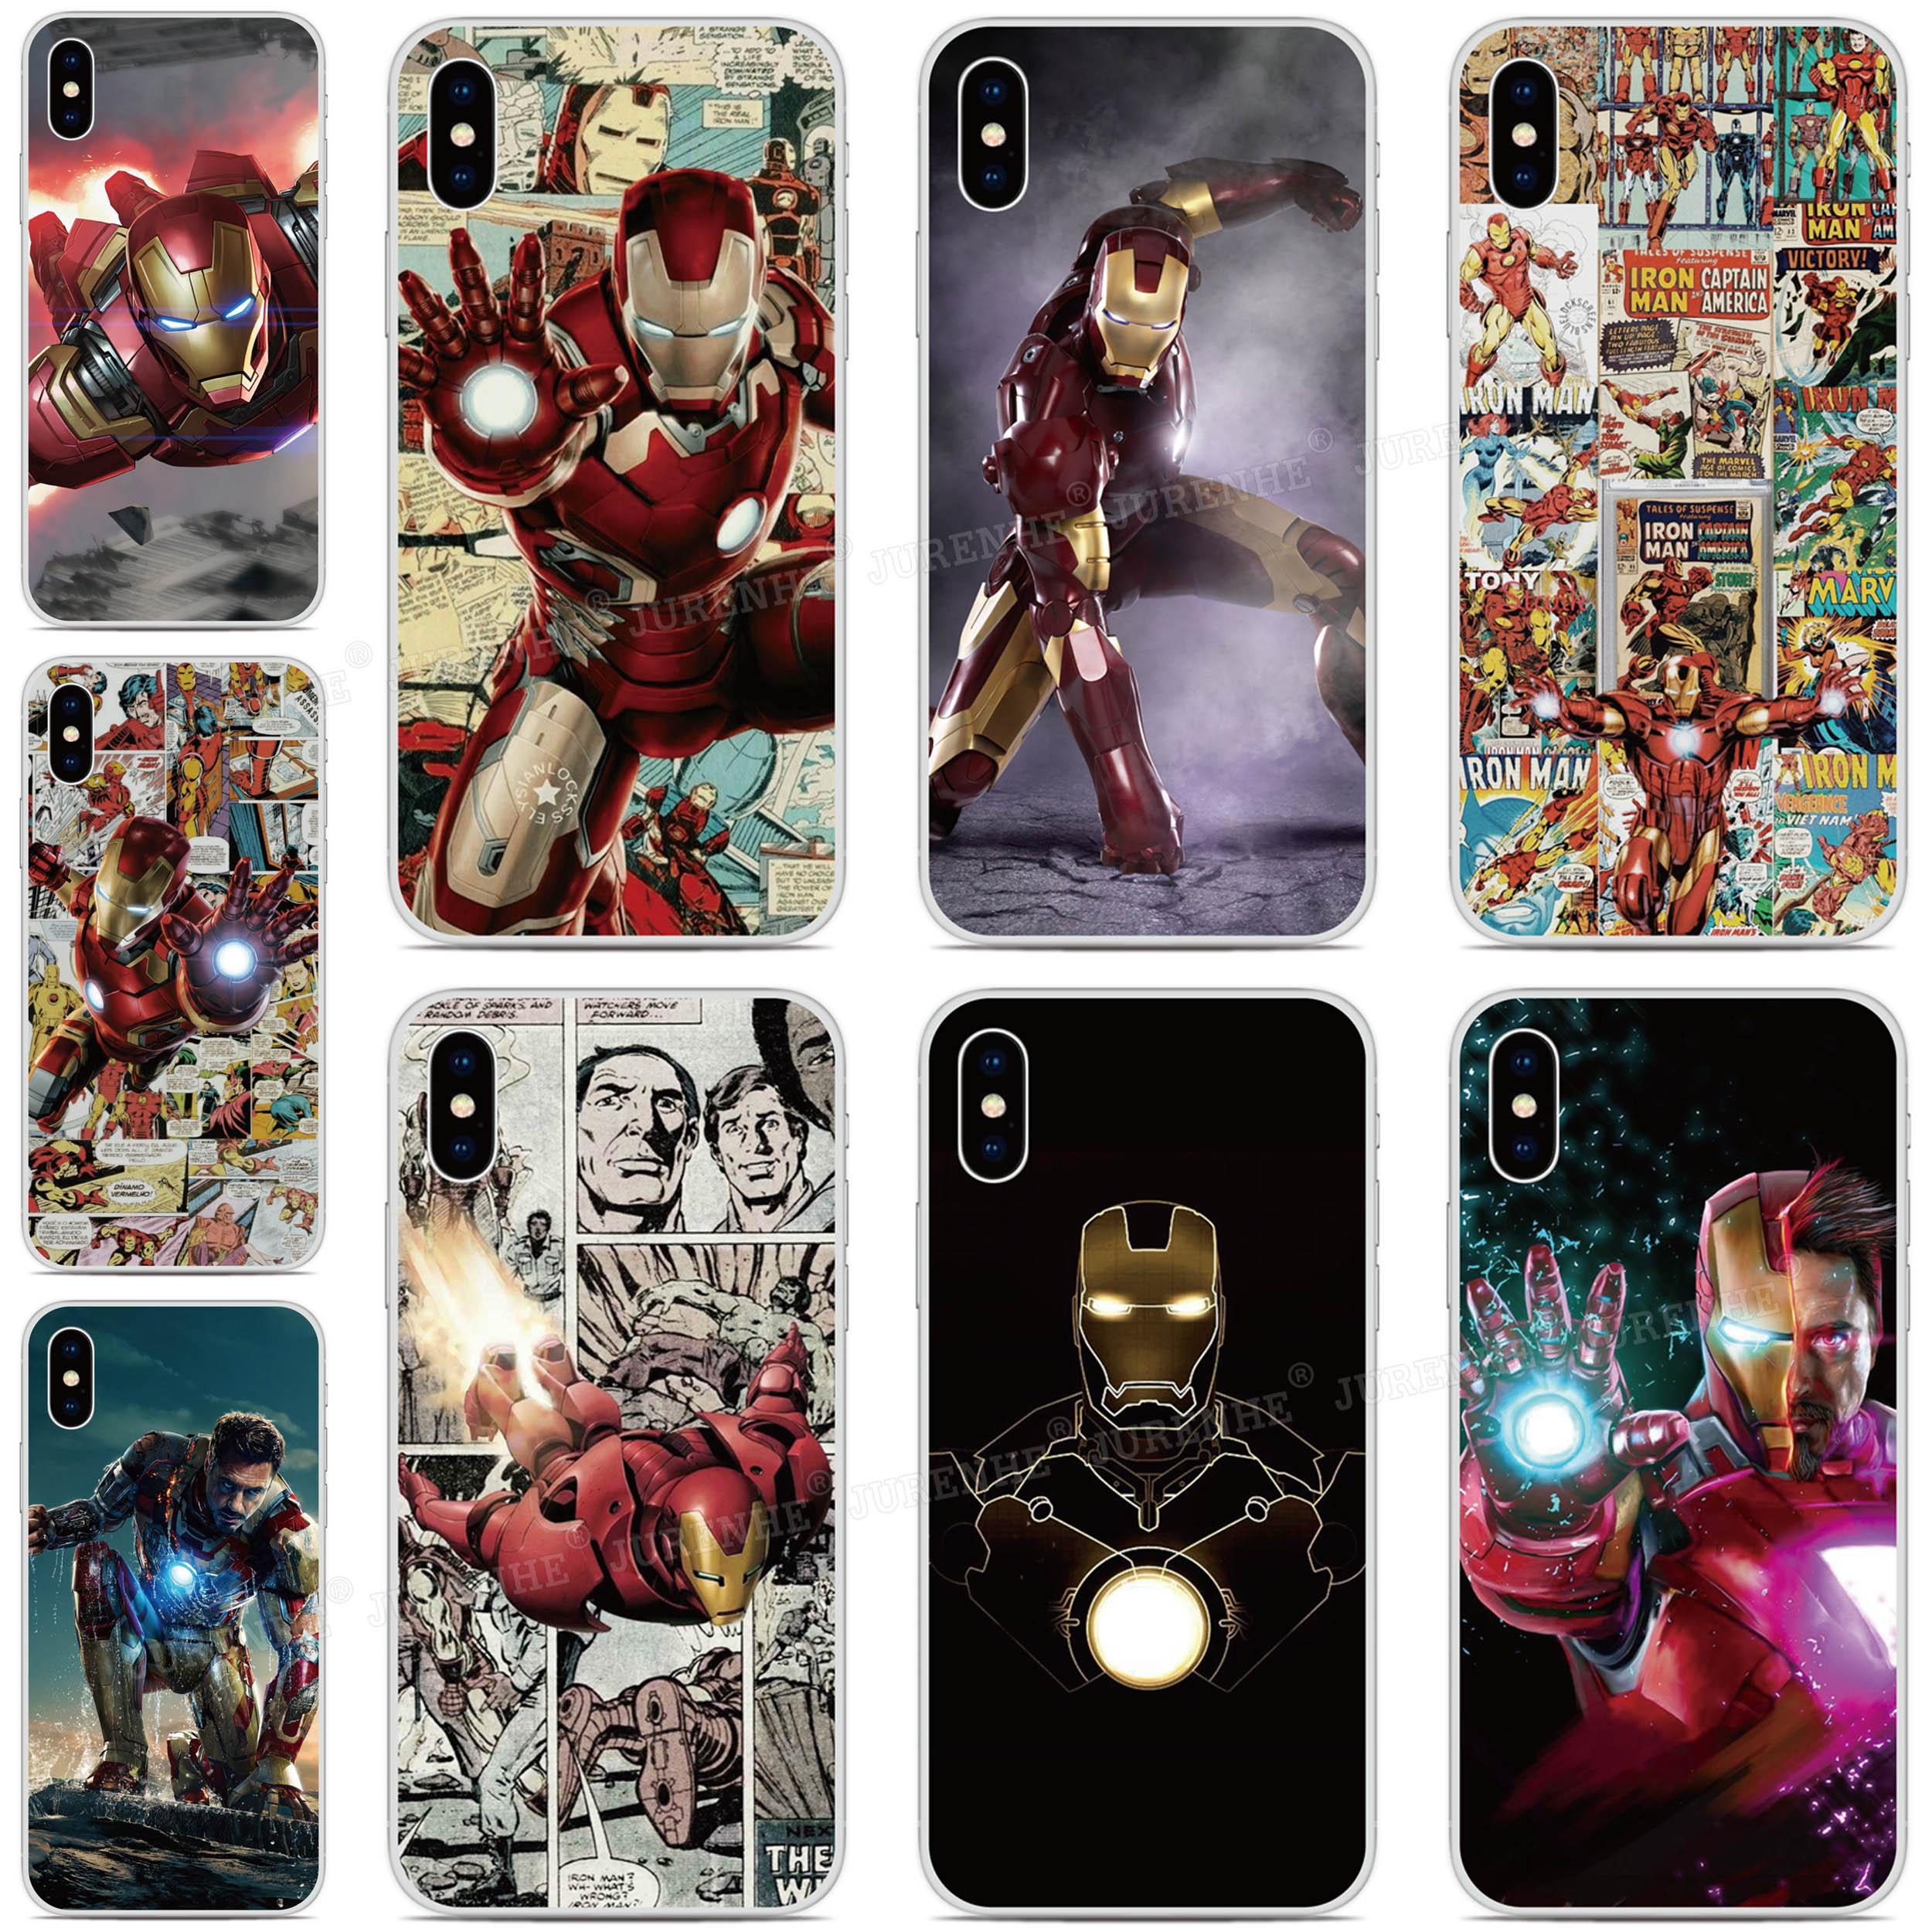 Imprimir Soft TPU superhéroe Iron Man teléfono caso para Ulefone Nota 7/nota 7 P/potencia 3 3 S/potencia/6/S10 S1 Pro S7 cubierta trasera de silicona